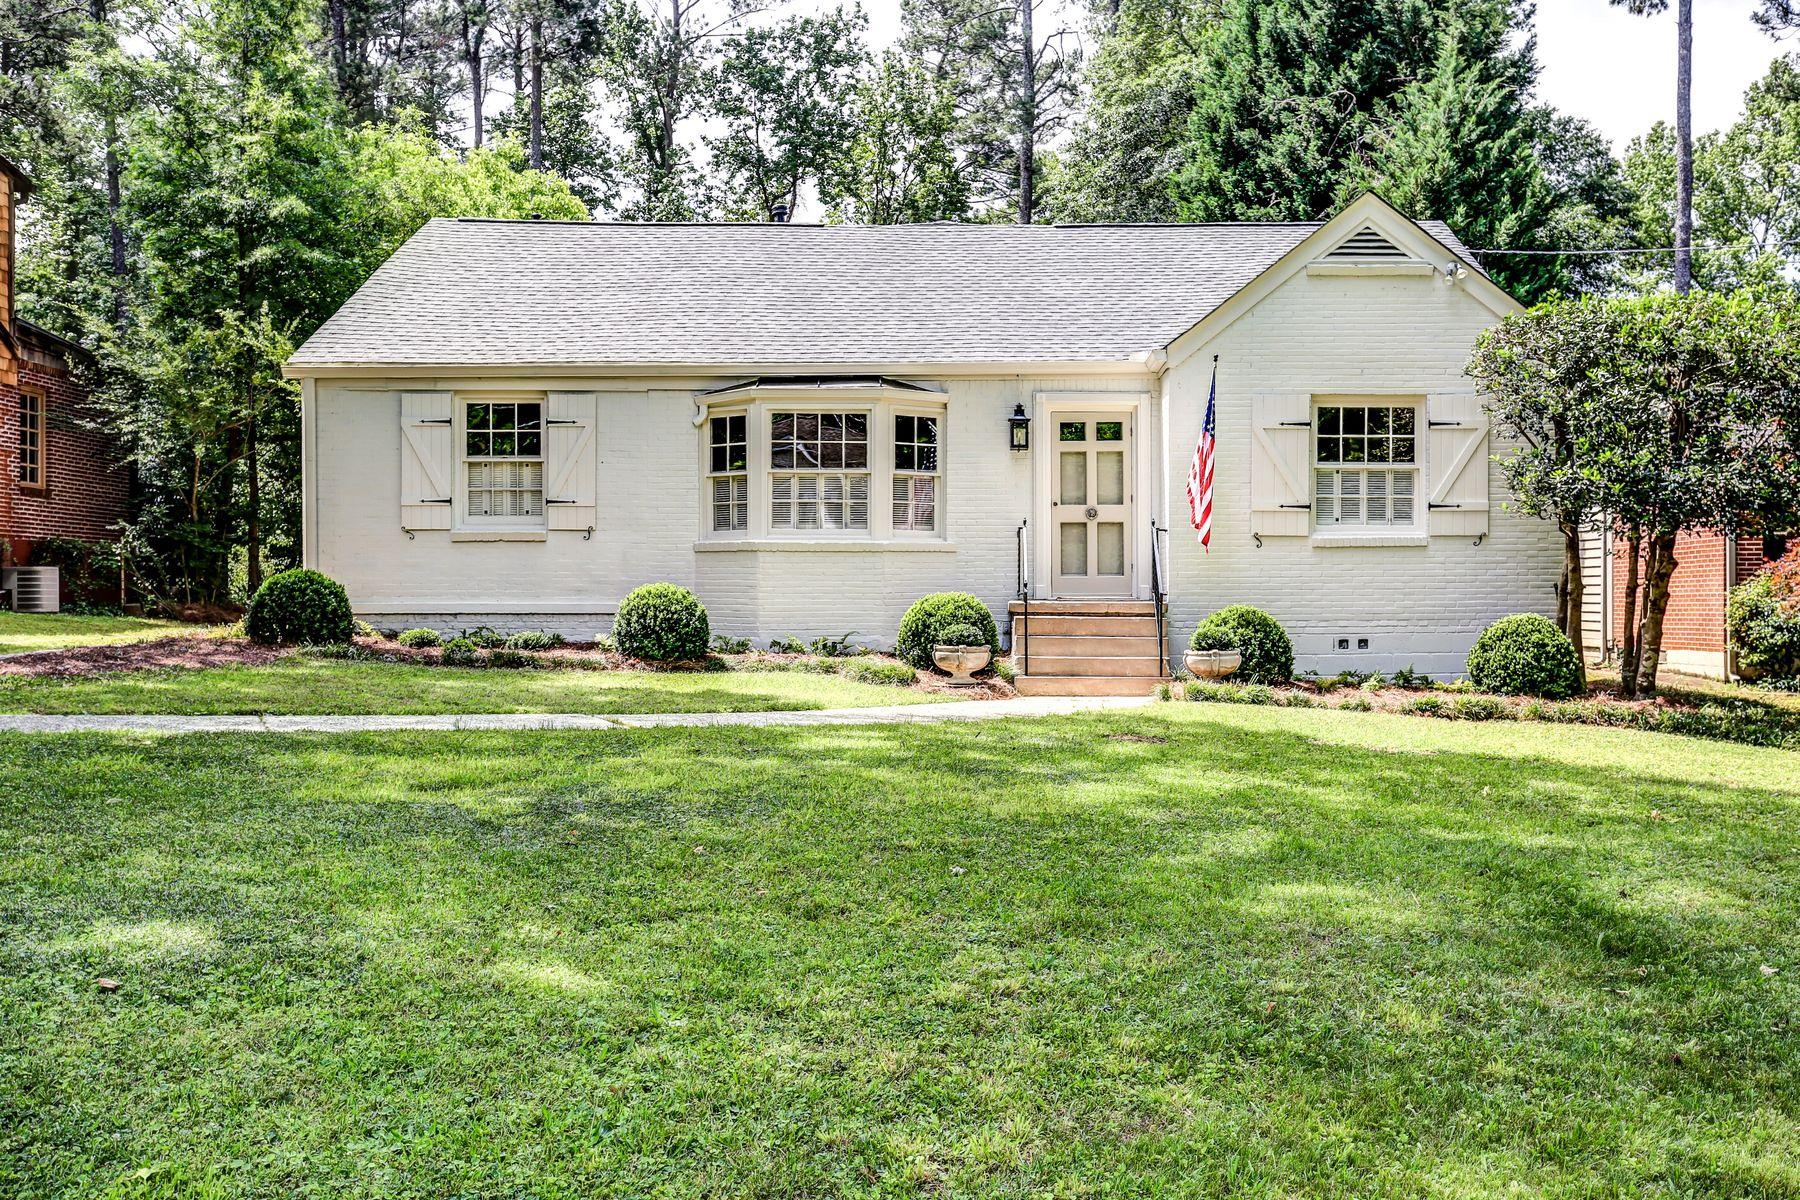 Casa para uma família para Venda às Designer's Personal Home in an Outstanding Glenwood Estates Location 248 Mout Vernon Drive Decatur, Geórgia, 30030 Estados Unidos